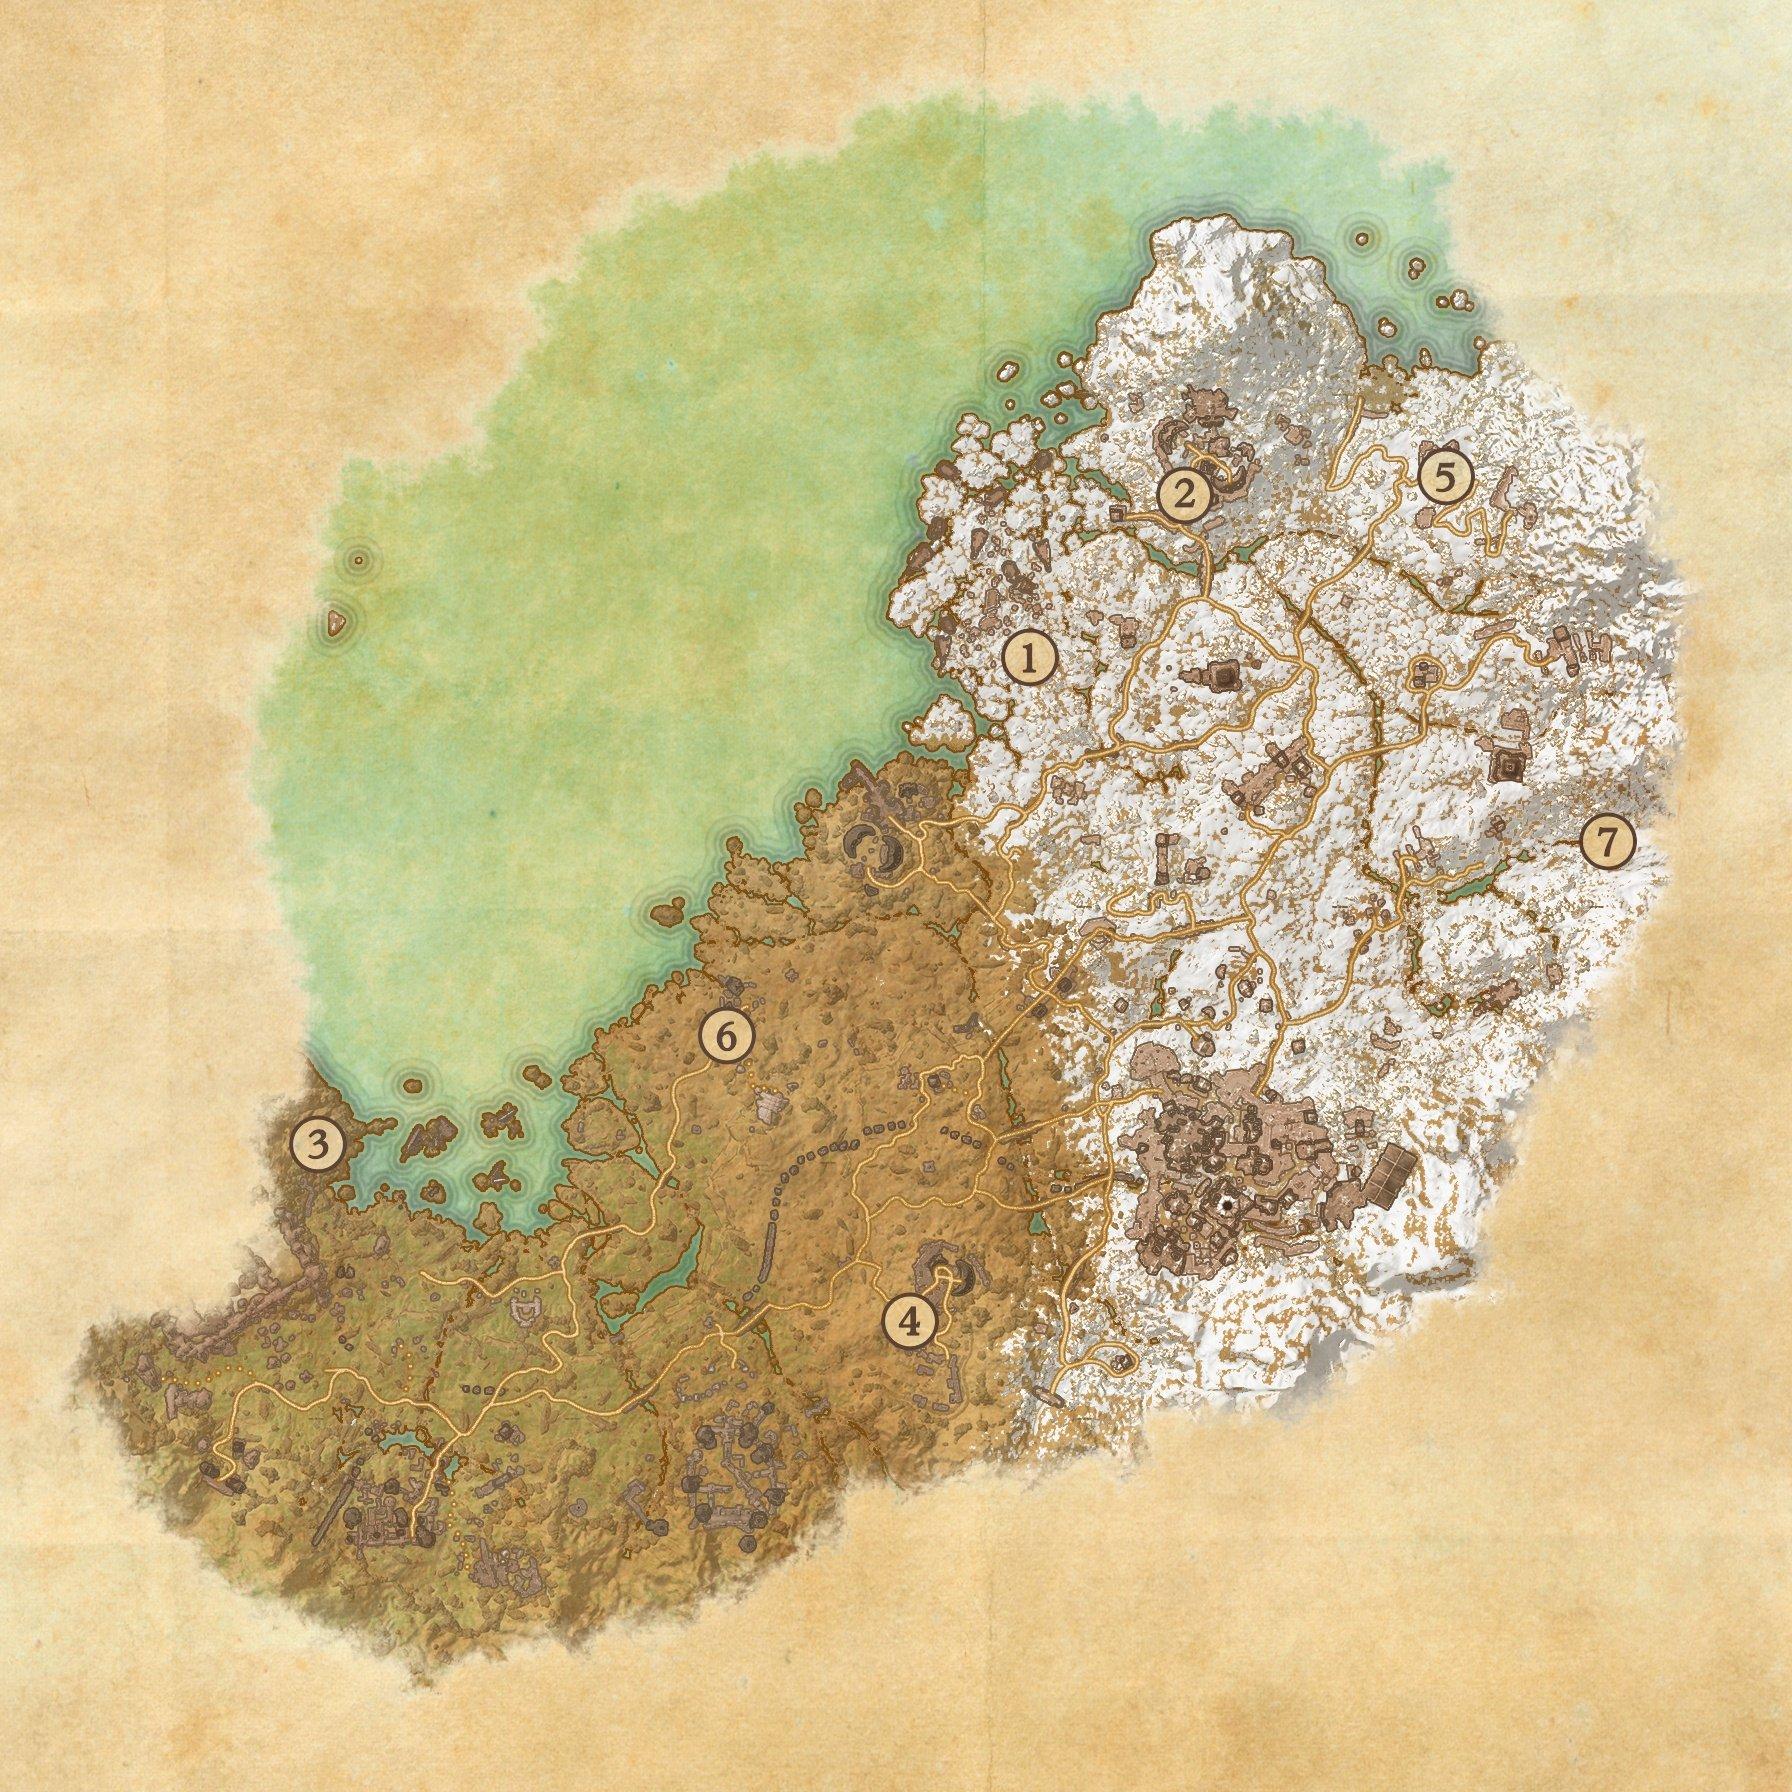 The Elder Scrolls Online Orsinium Map Is Unsurprisingly Mive ... on